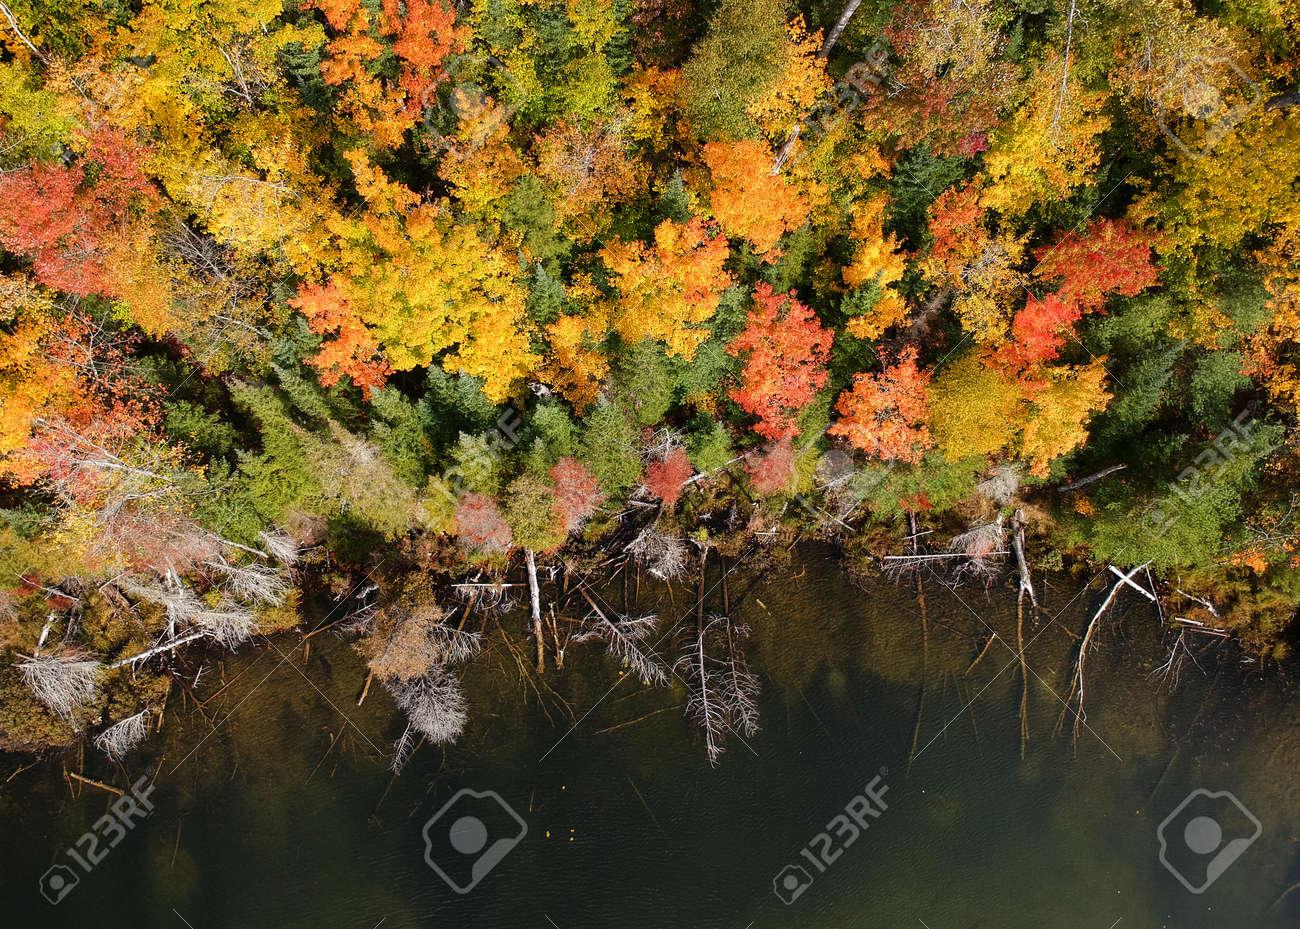 Aerial view of fall foliage along Council lake in Michigan upper Peninsula - 163916596